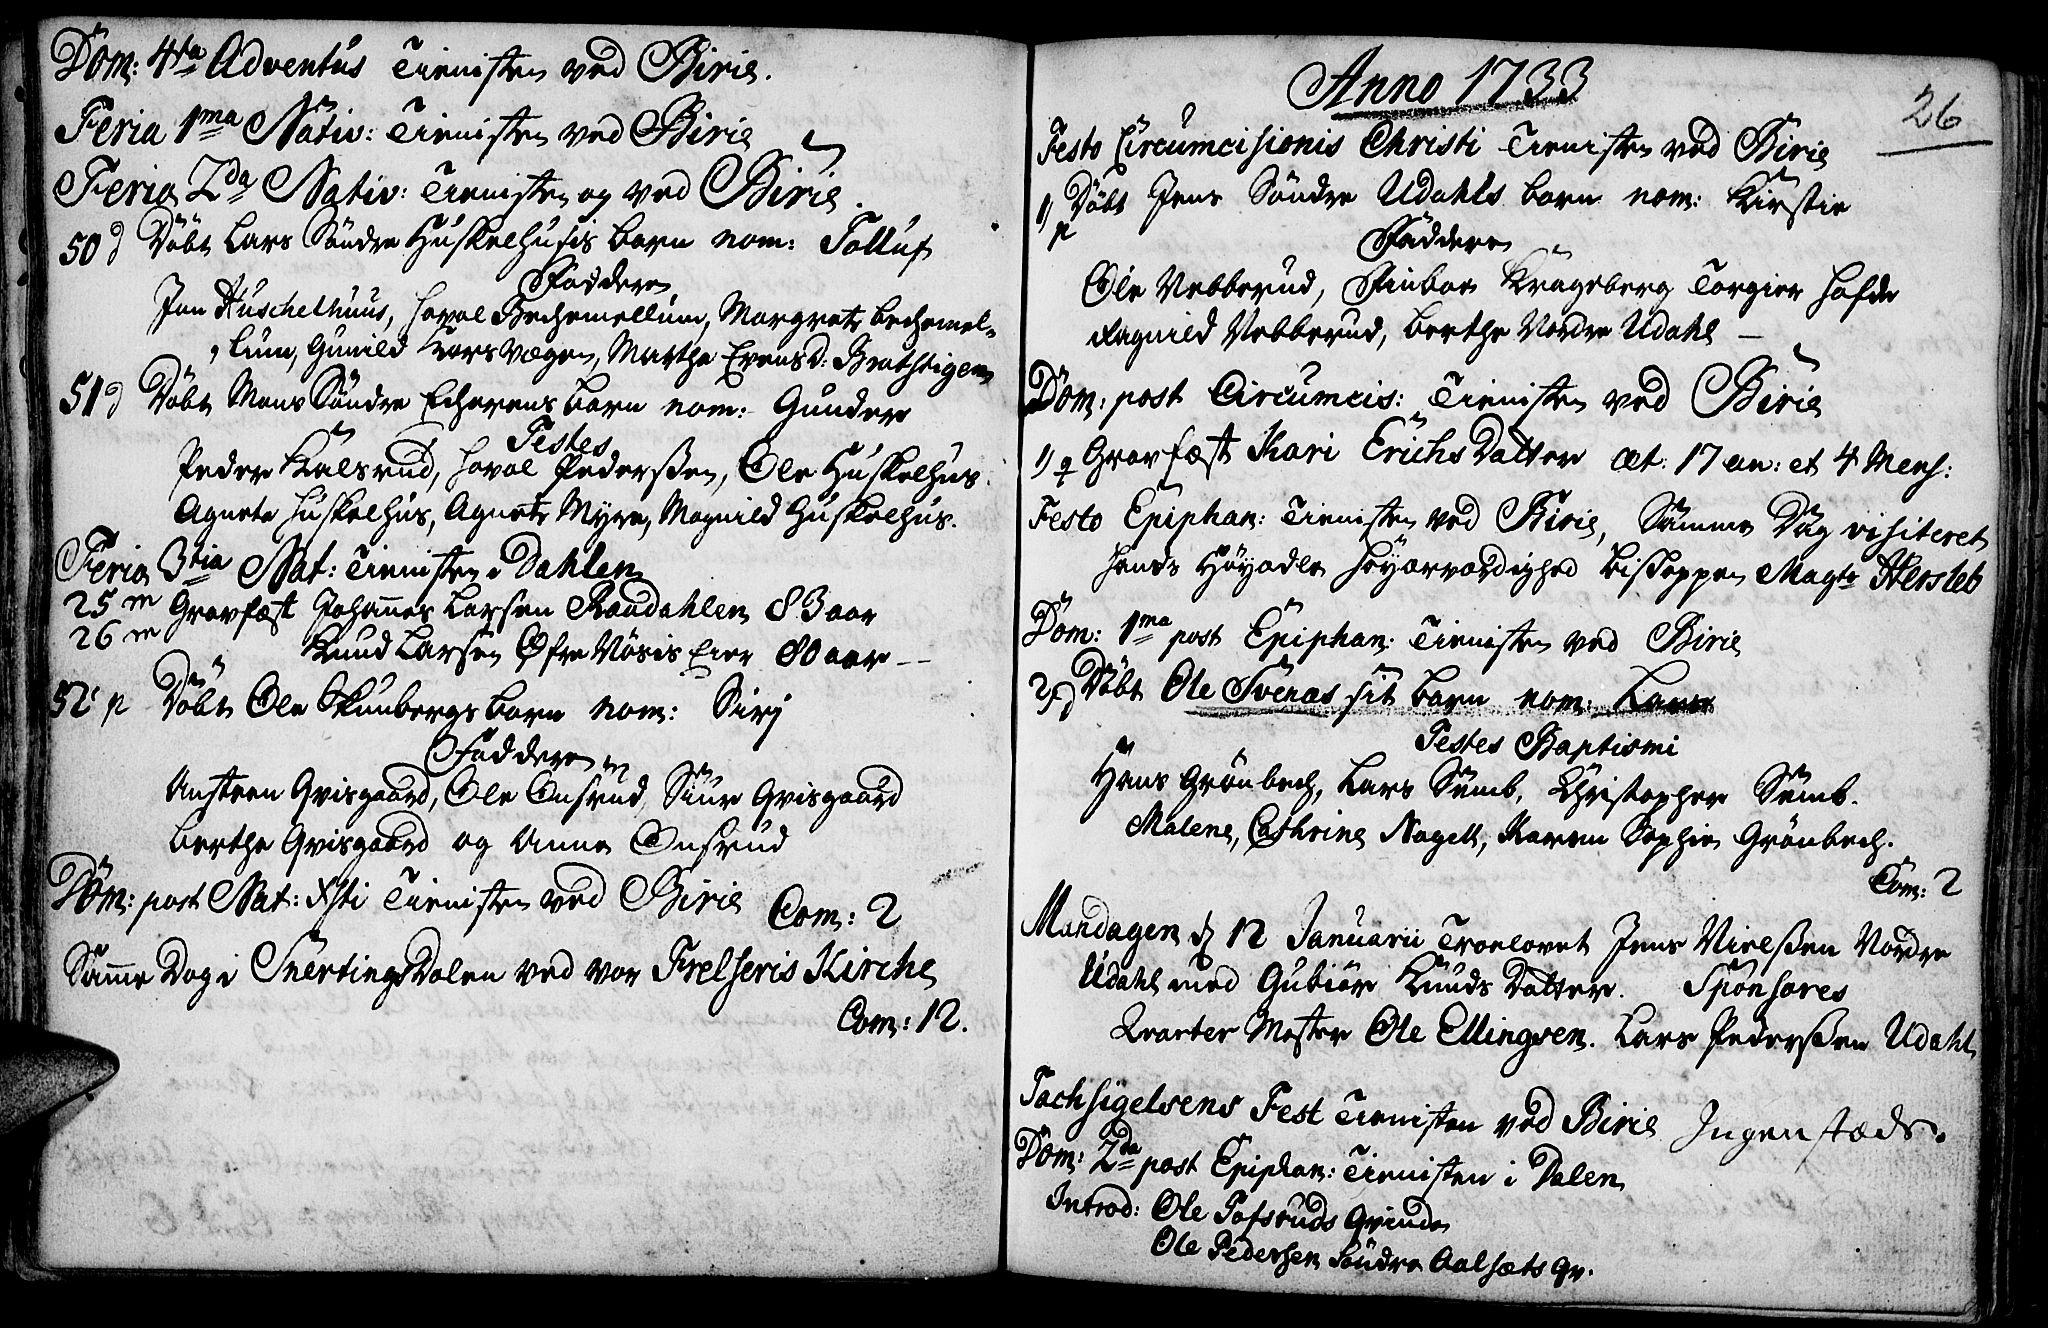 SAH, Biri prestekontor, Ministerialbok nr. 1, 1730-1754, s. 26